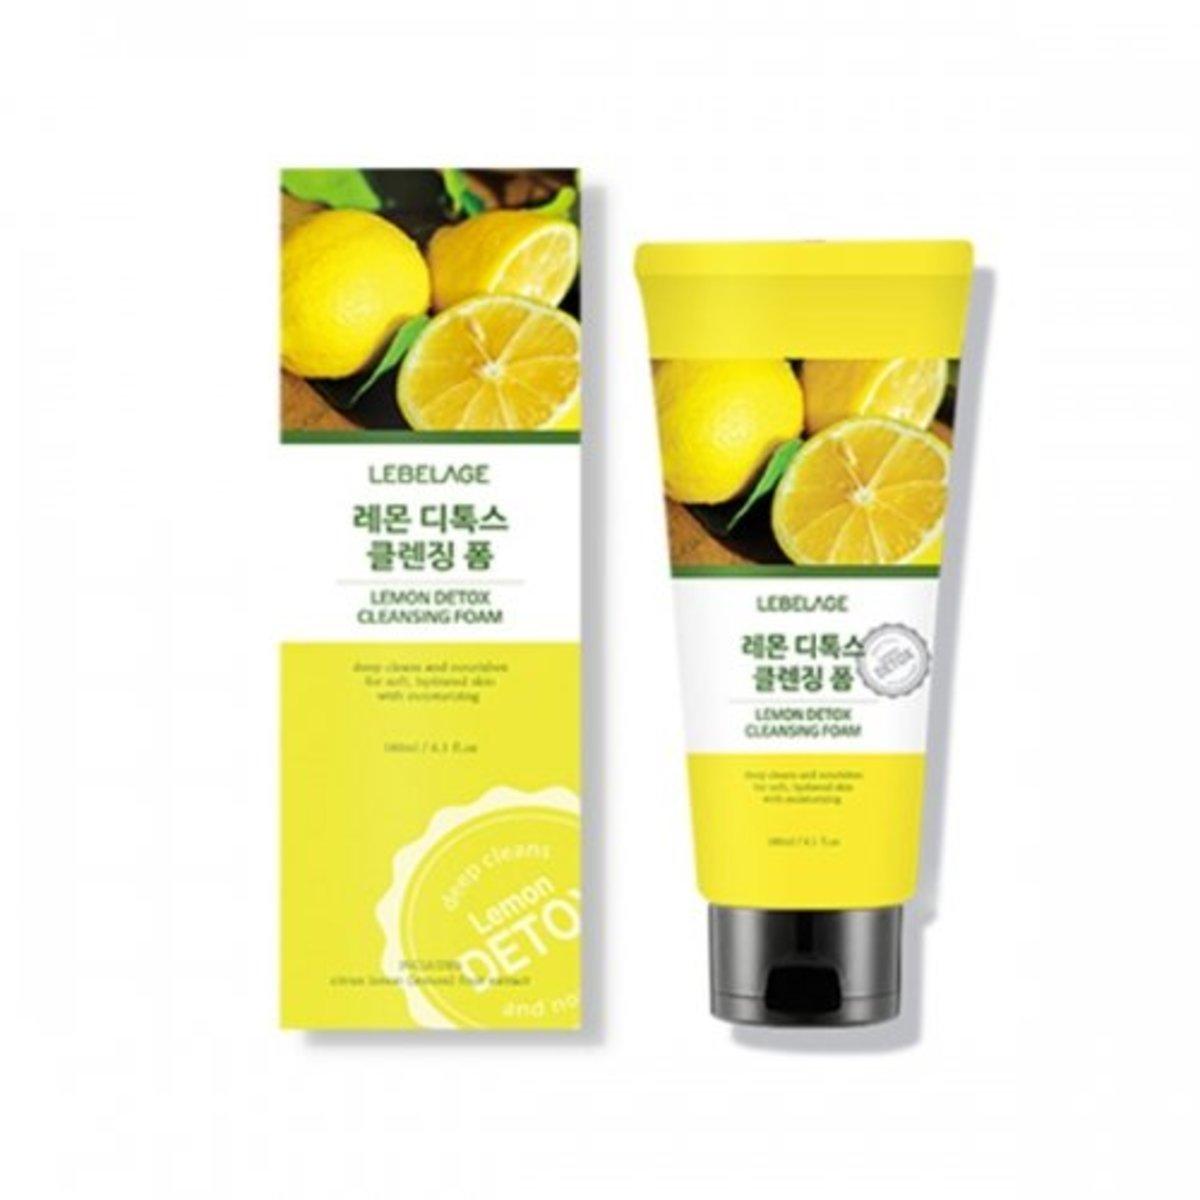 lemon detox cleansing foam180ml